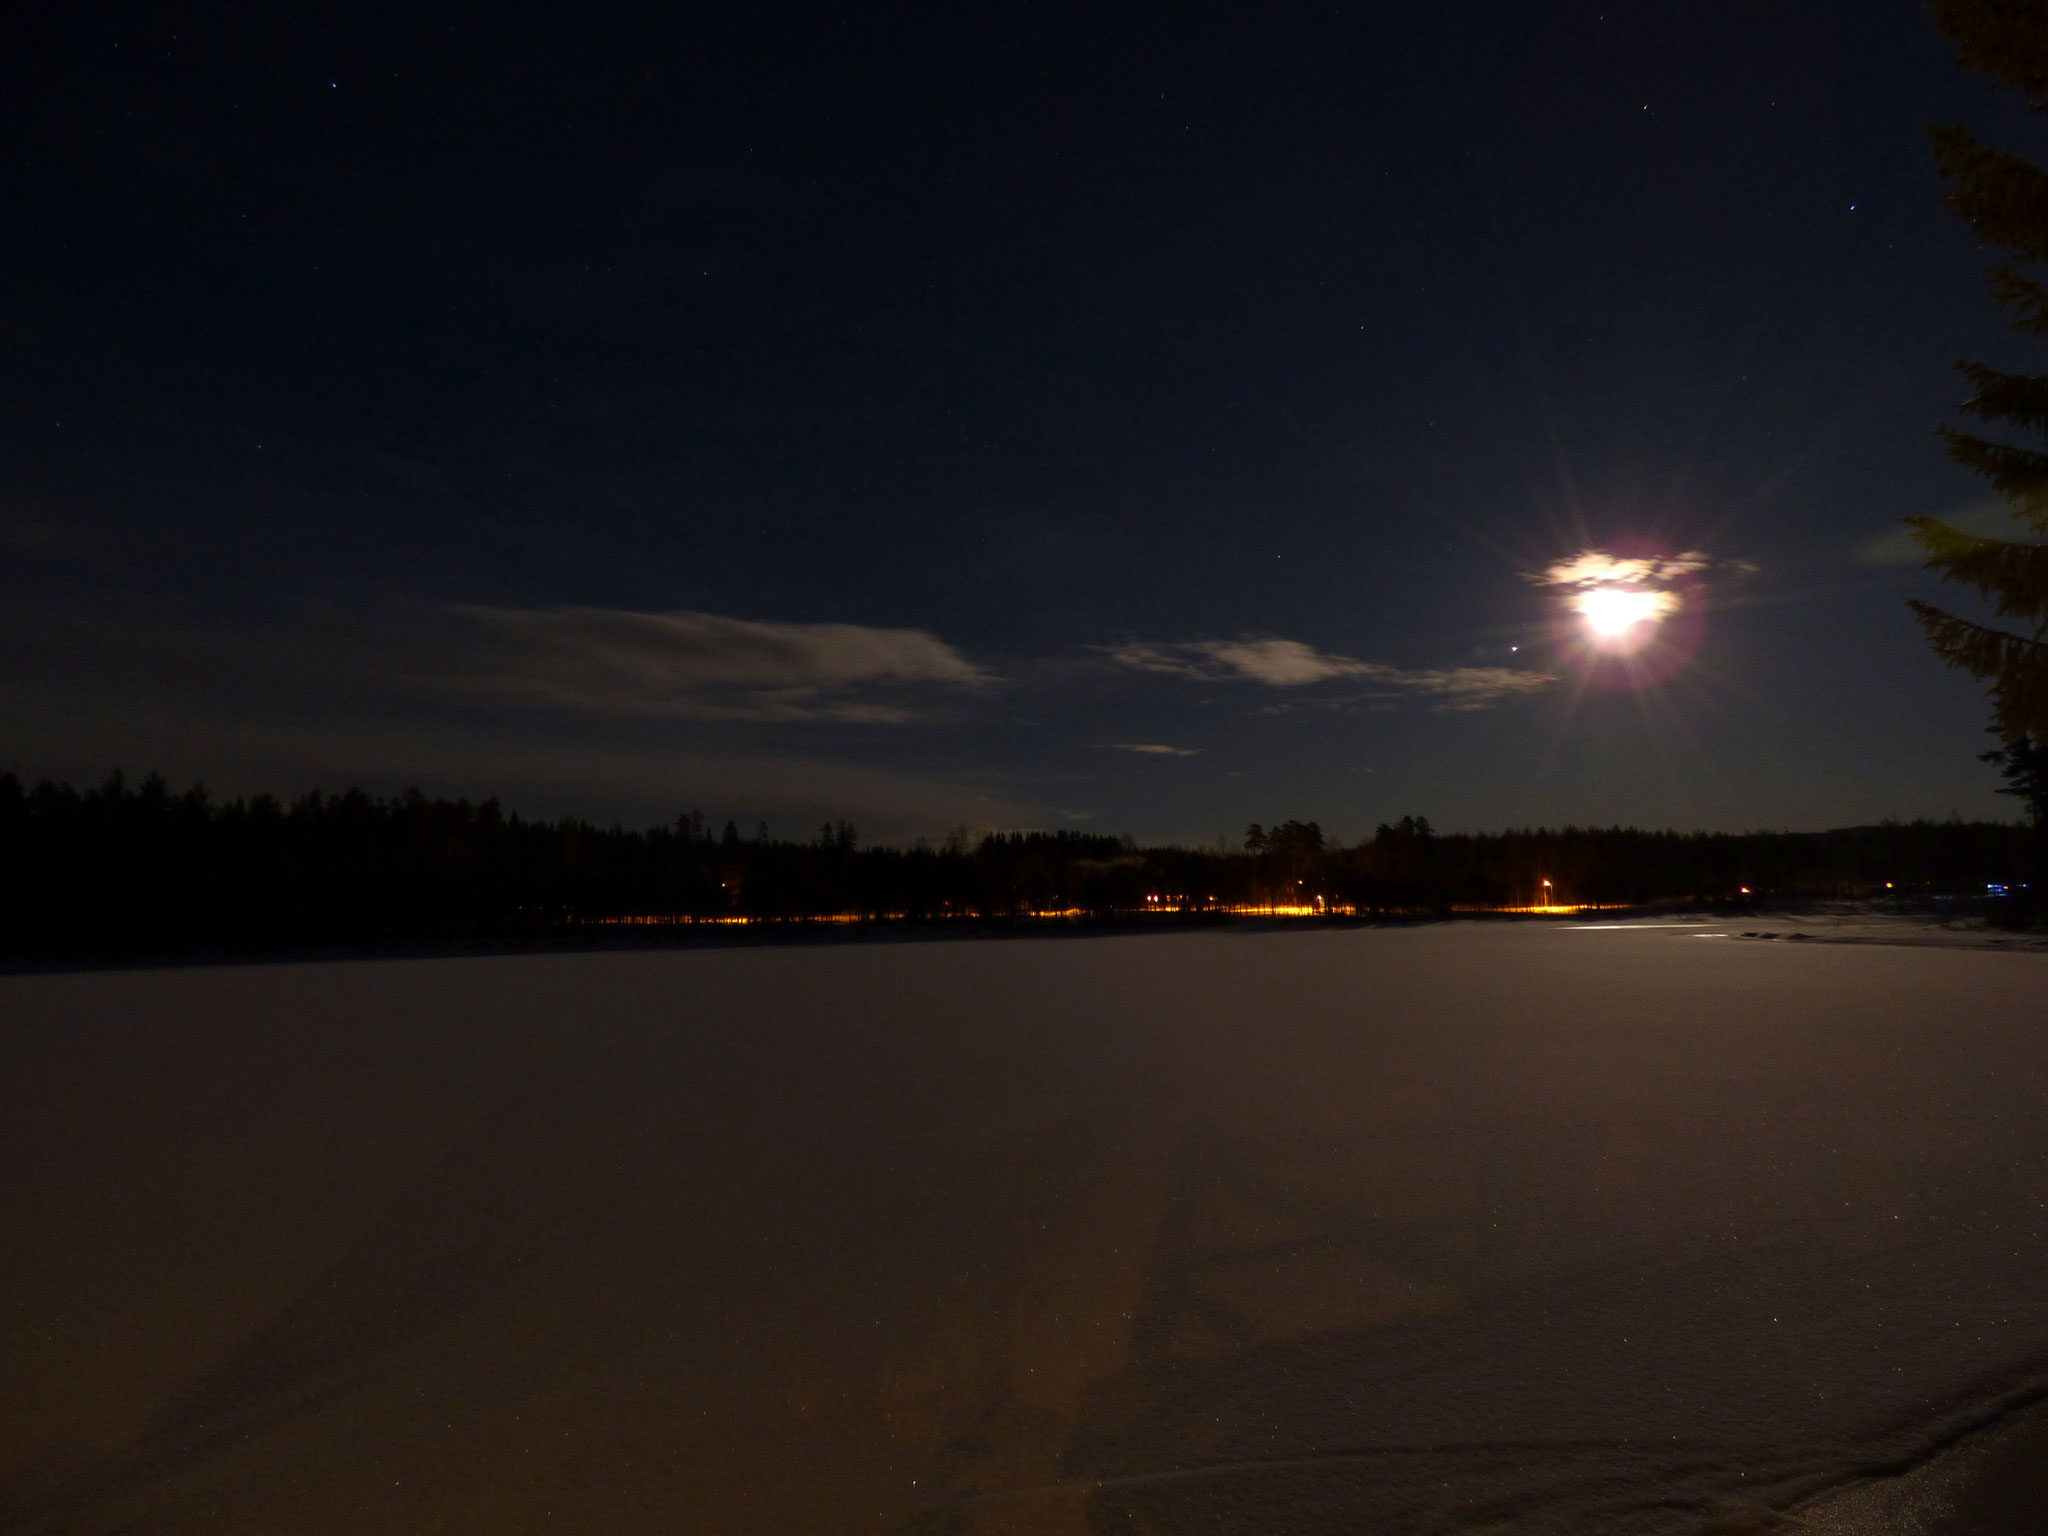 Fullmåne över den frusna sjön